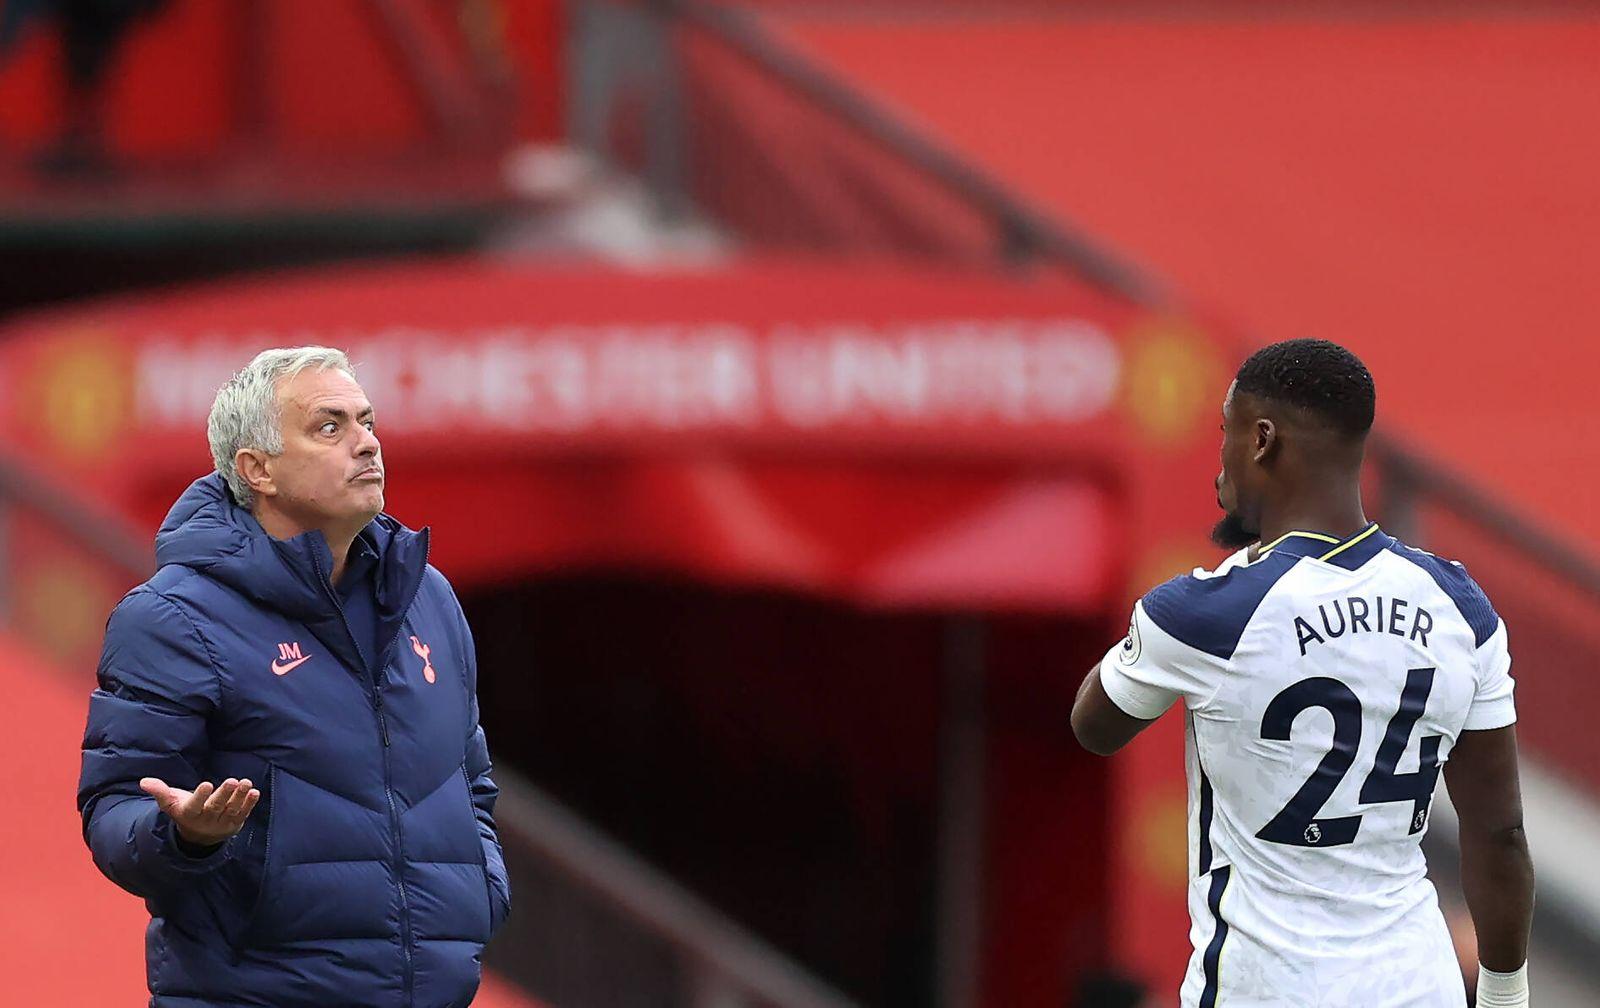 Manchester United, ManU v Tottenham Hotspur - Premier League - Old Trafford Tottenham Hotspur manager Jose Mourinho spe